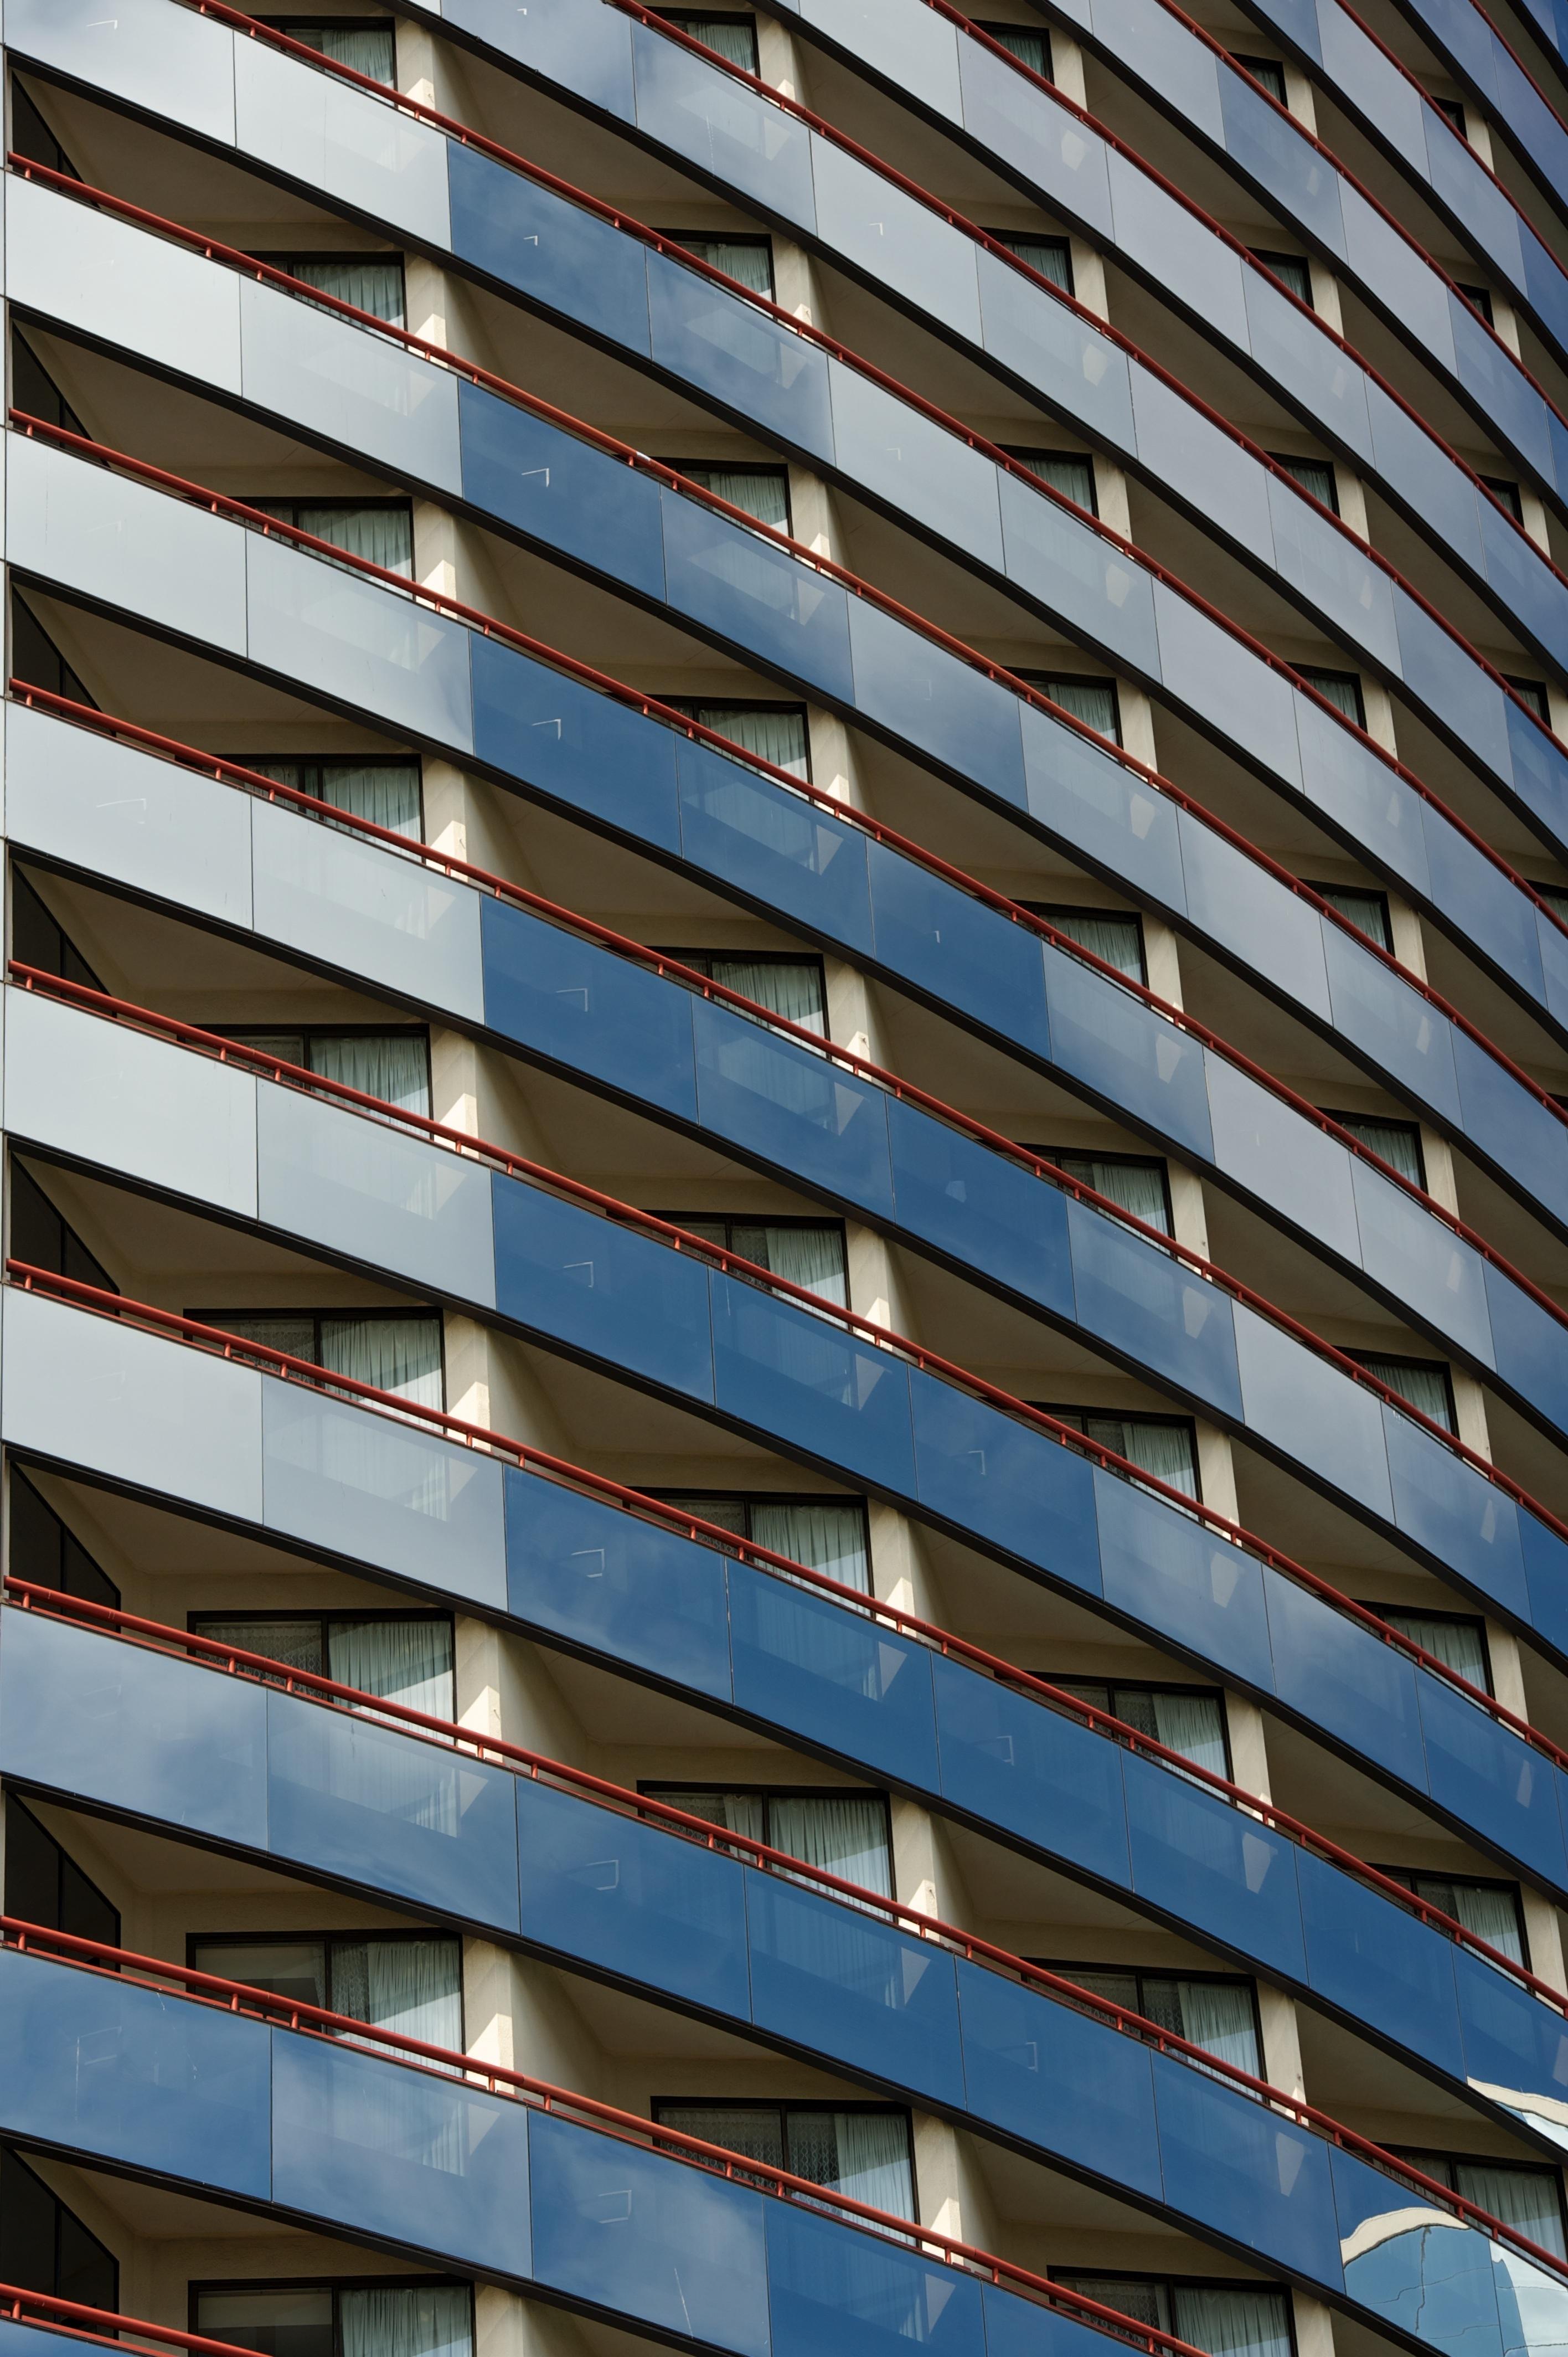 Fotos Gratis Arquitectura Textura Rascacielos Urbano